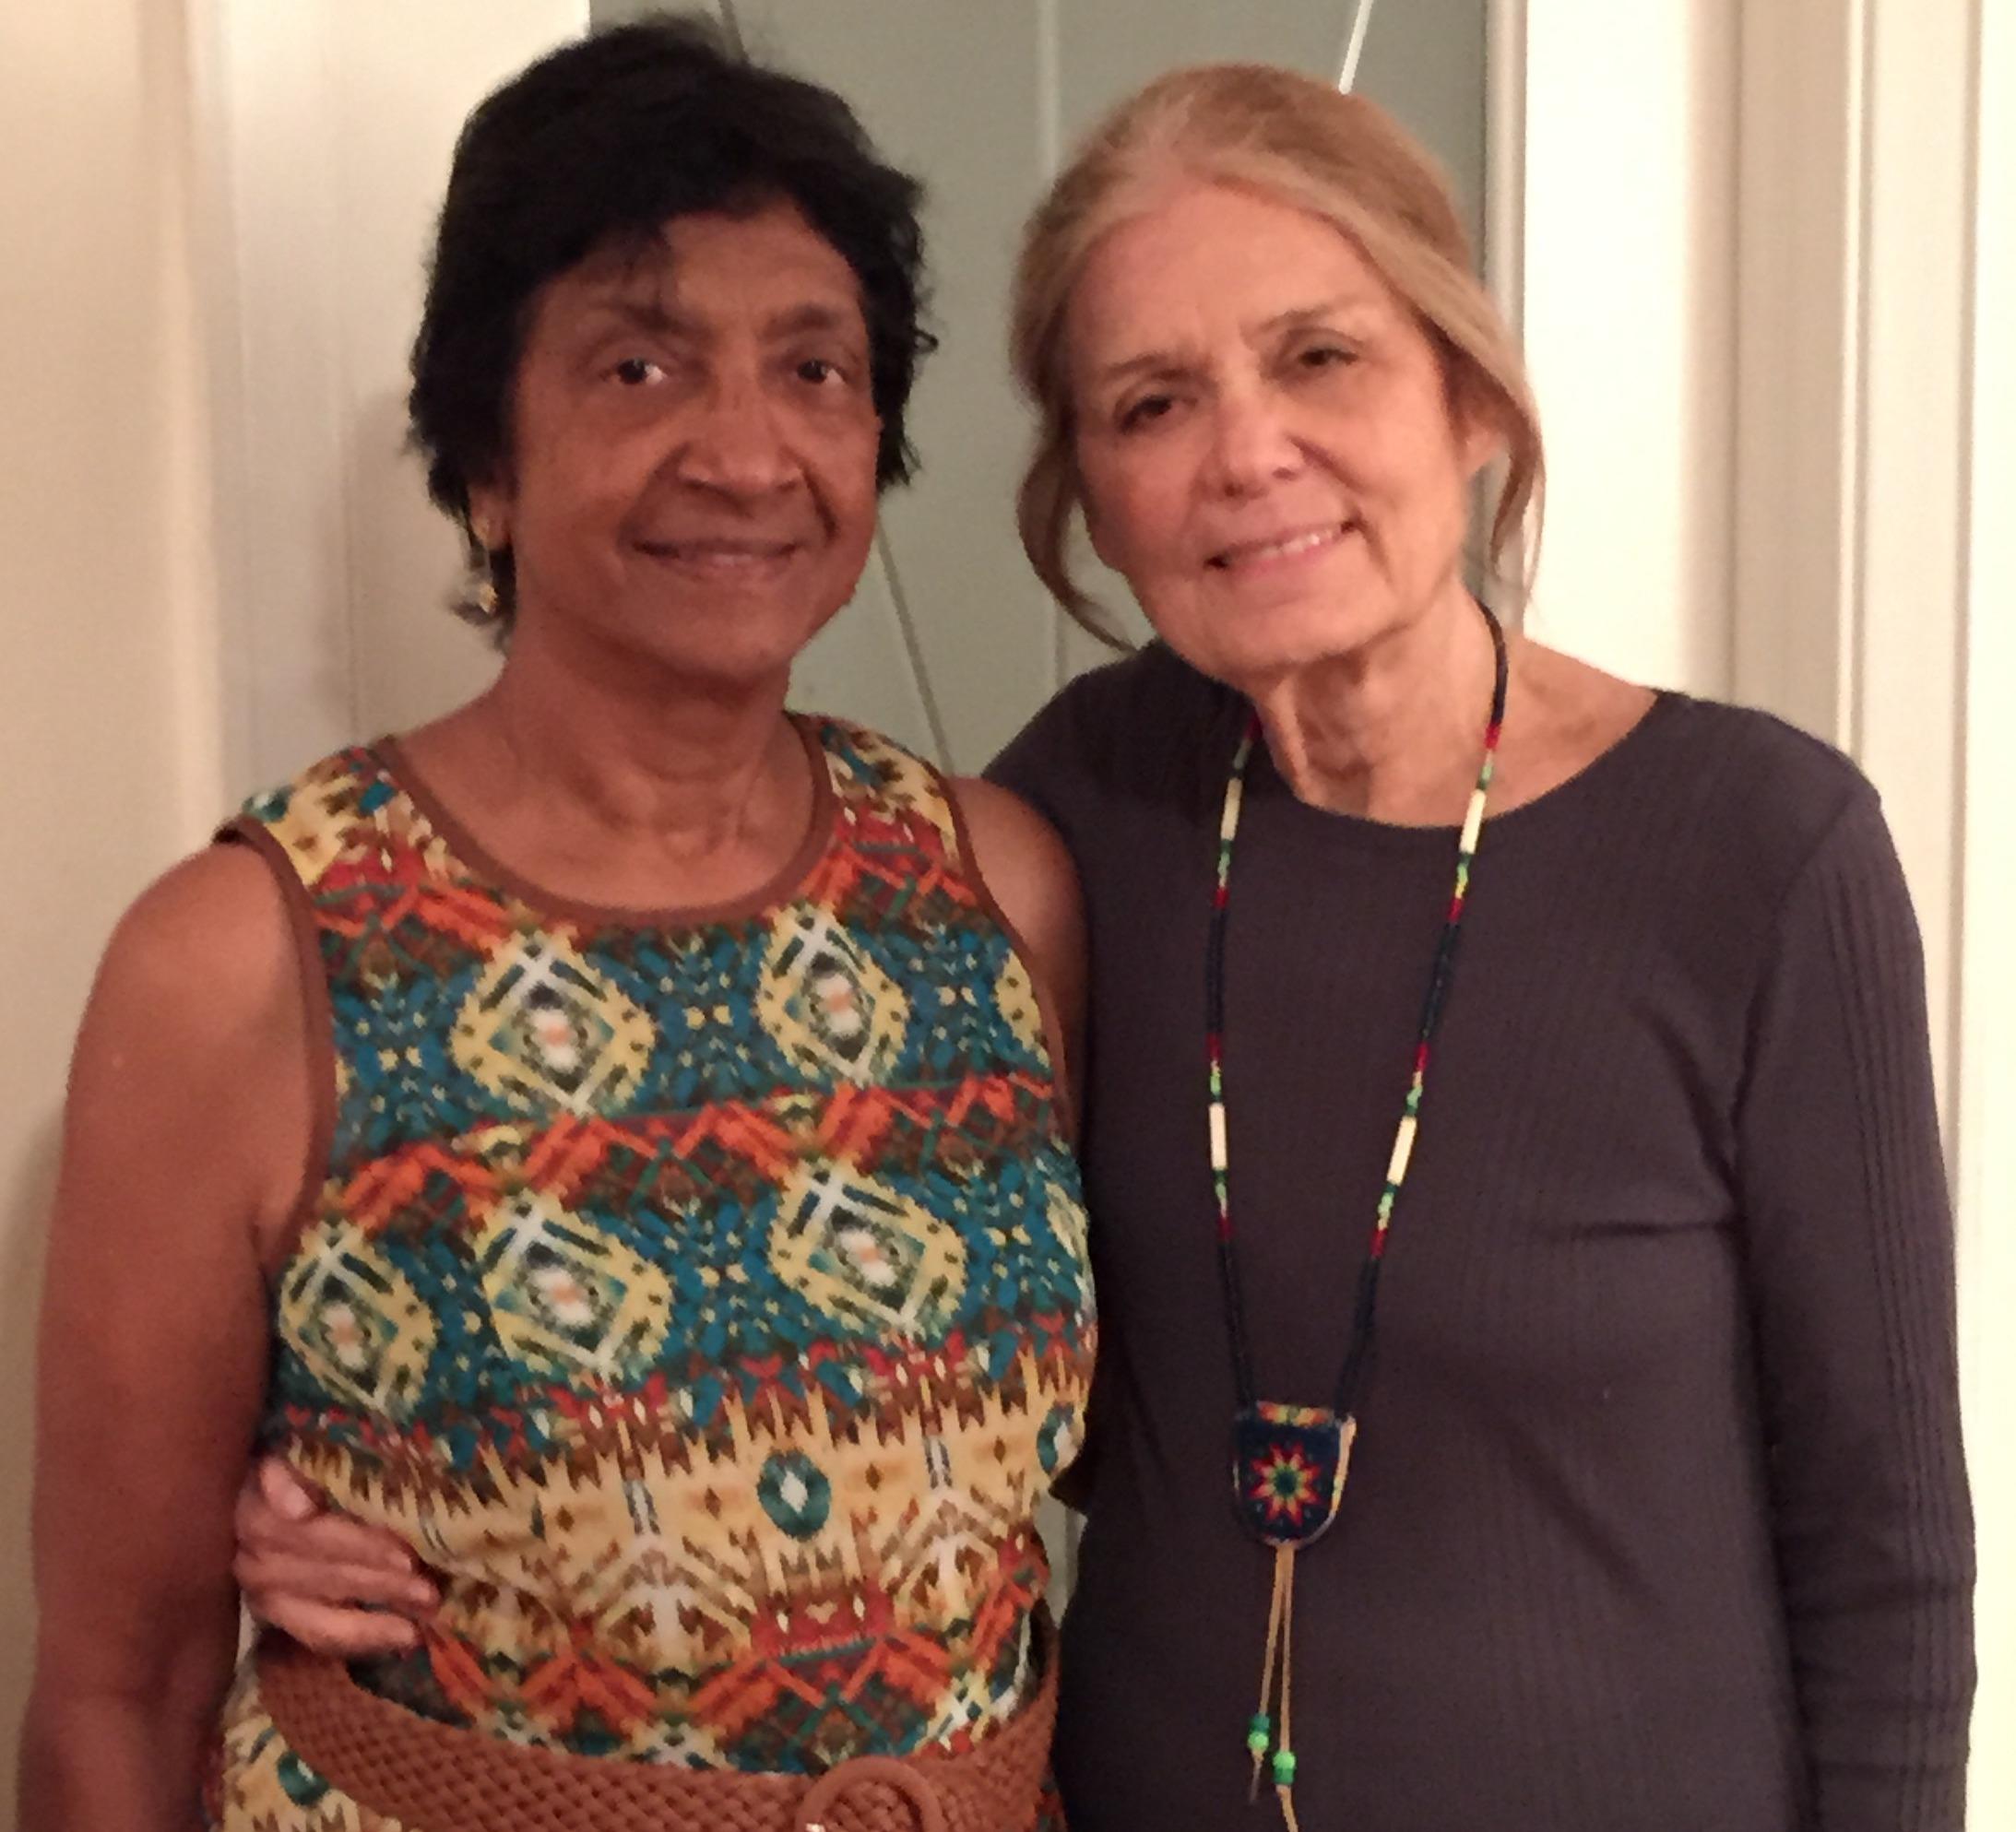 Gloria Steinem, Co-Convenor, Donor Direct Action Fund for Women